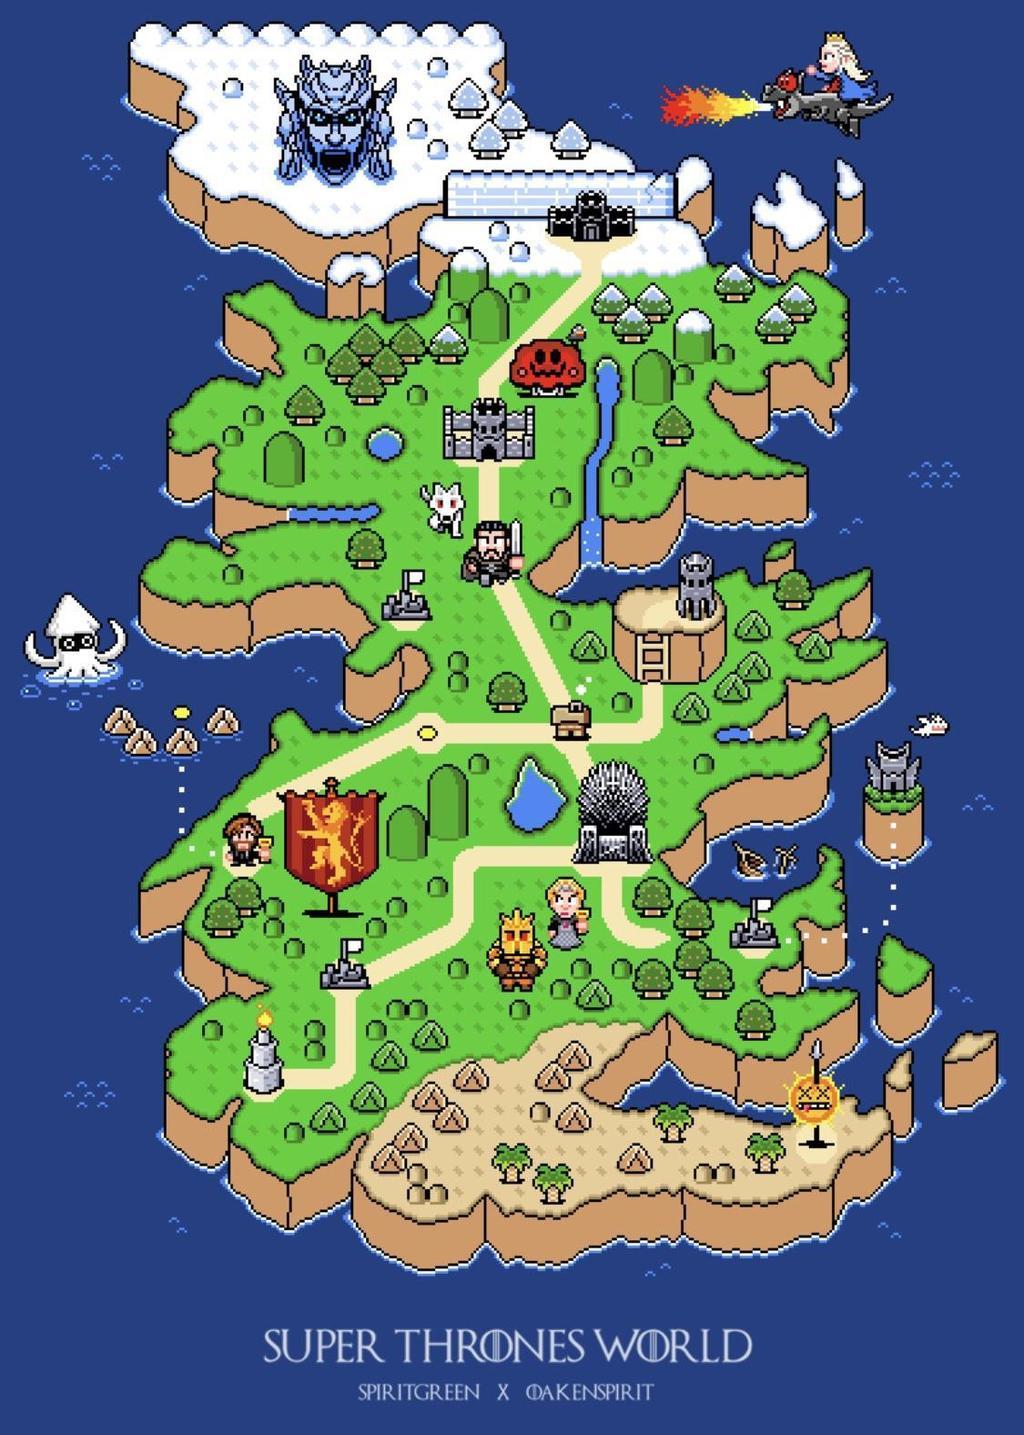 Intrygujące mapy na Joe Monster